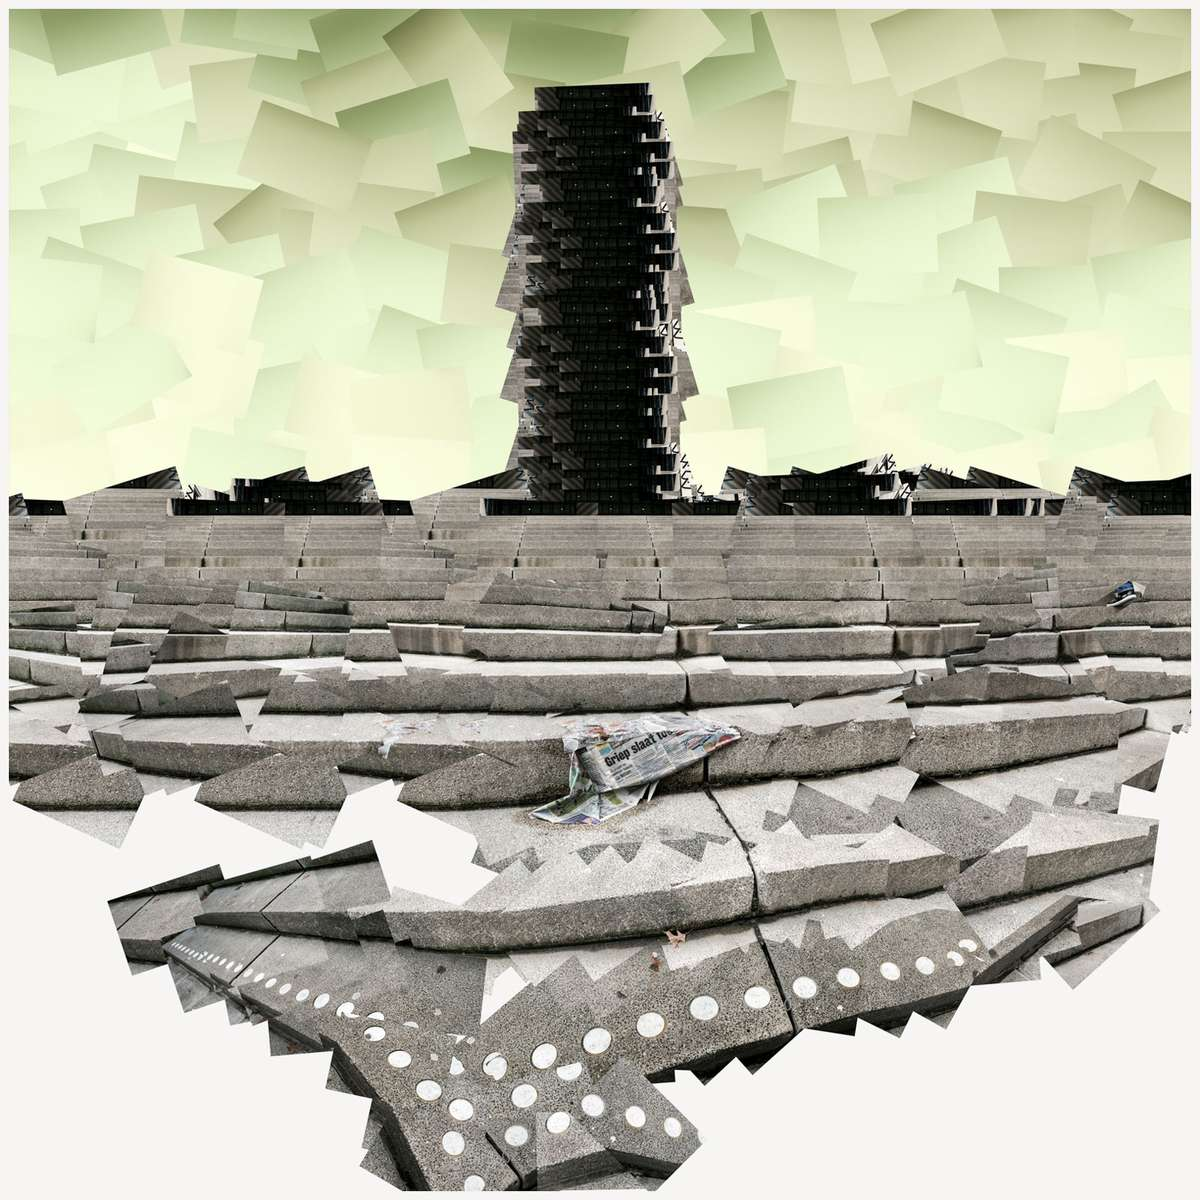 Monument, 2013, pigment print, 85 x 85 cm (33.46 x 33.46 in), edition of 6 + 1 AP